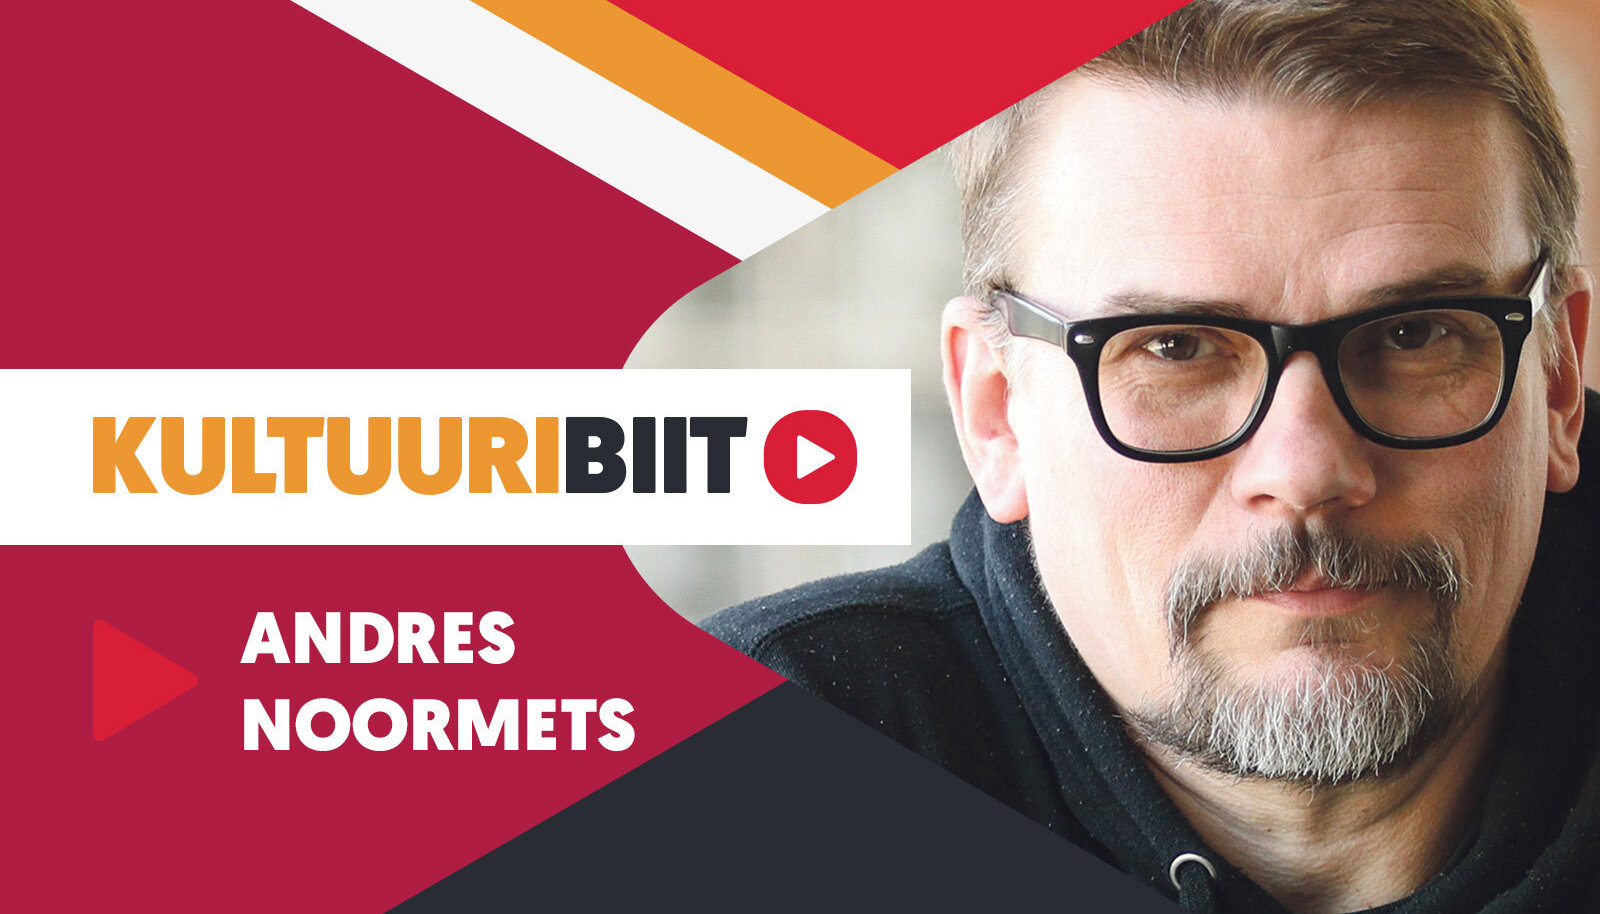 Andres Noormets